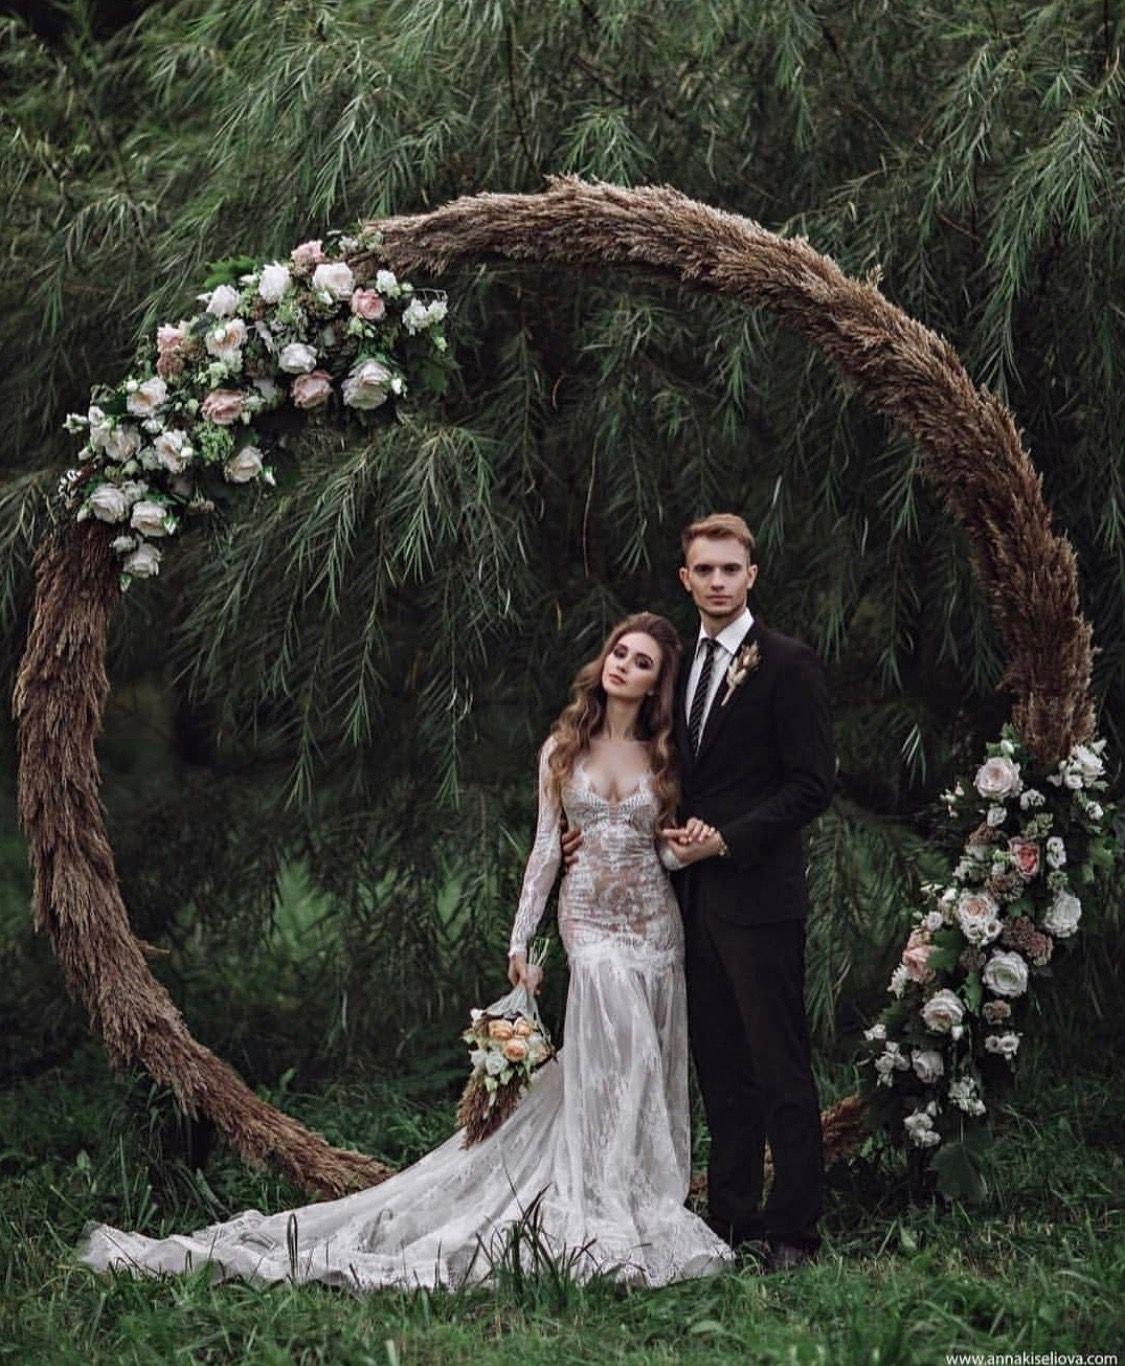 Pin by Monica on Wedding   Wiccan wedding, Pagan wedding